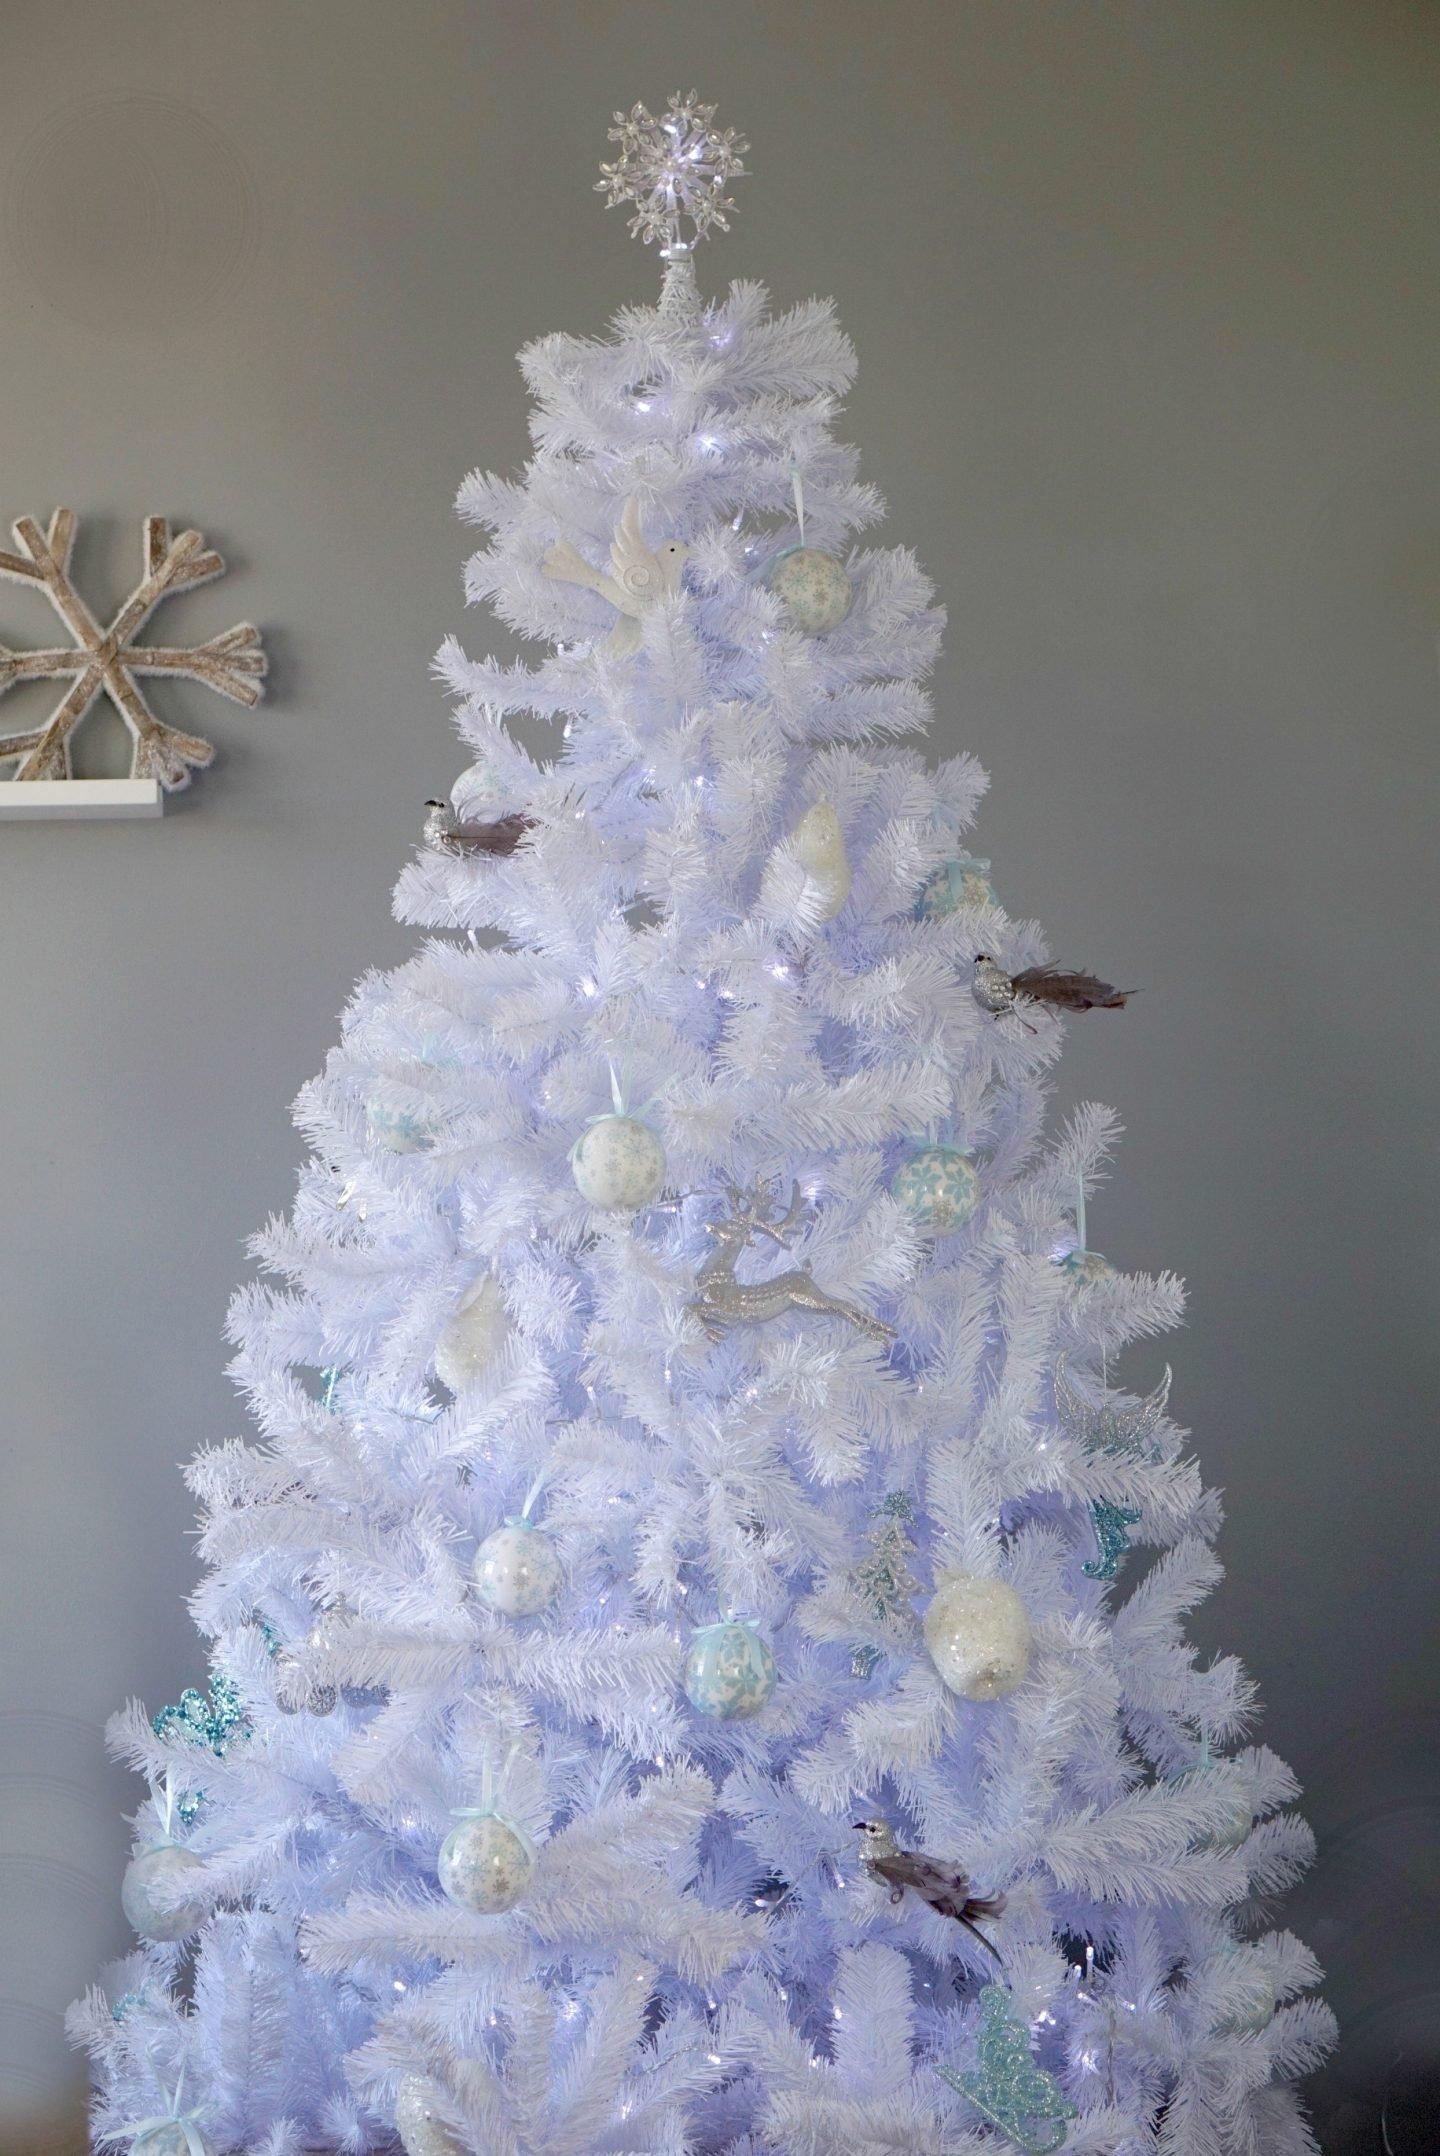 White Christmas Tree and Decorations www.extraordinarychaos.com